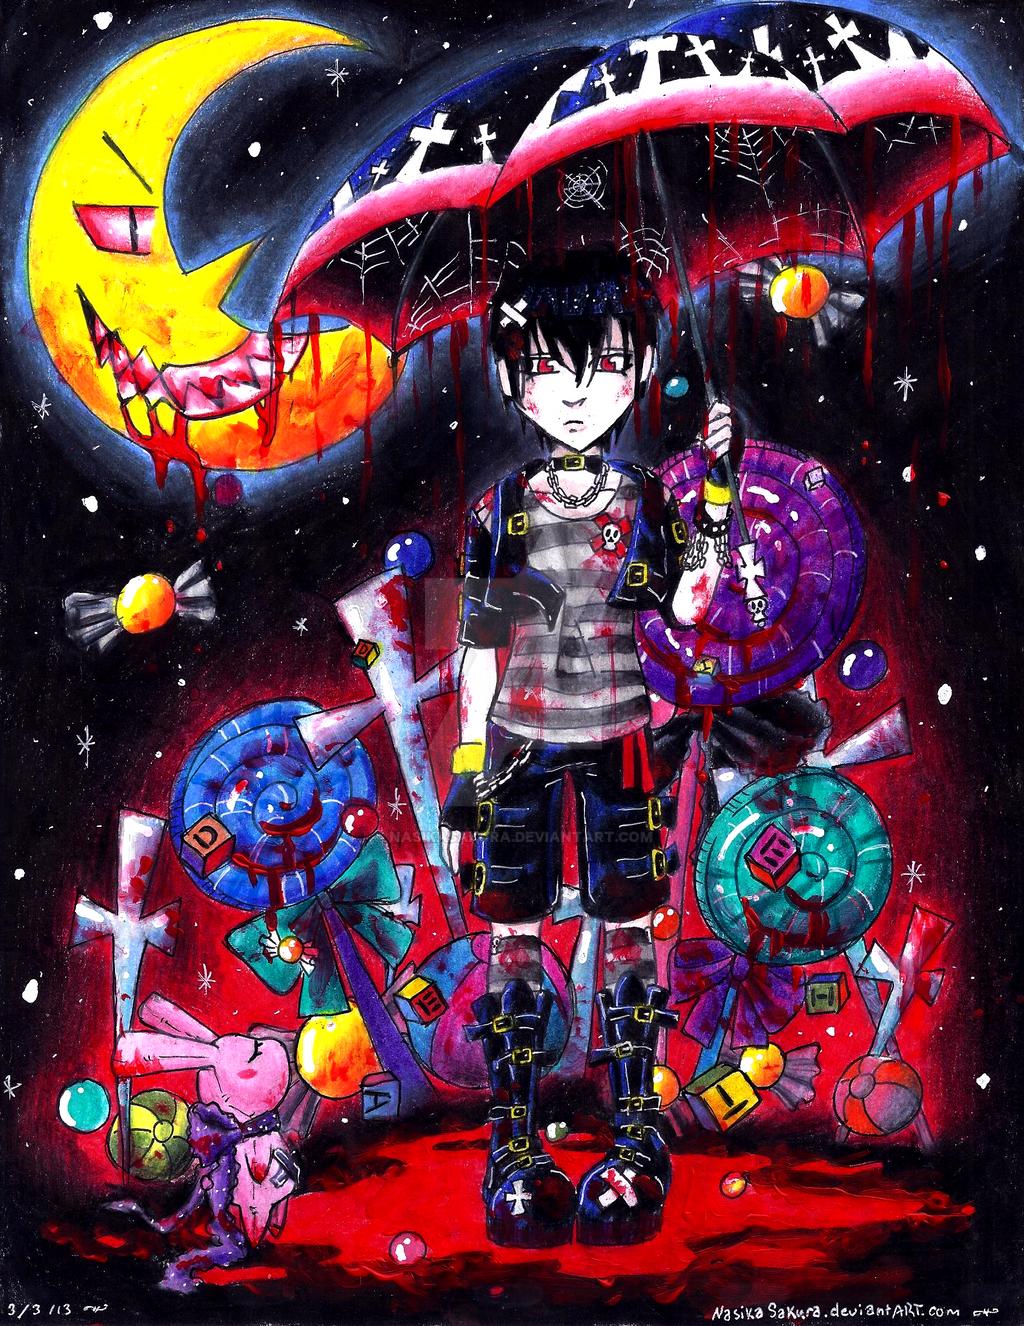 Where Has the Innocence Gone by NasikaSakura